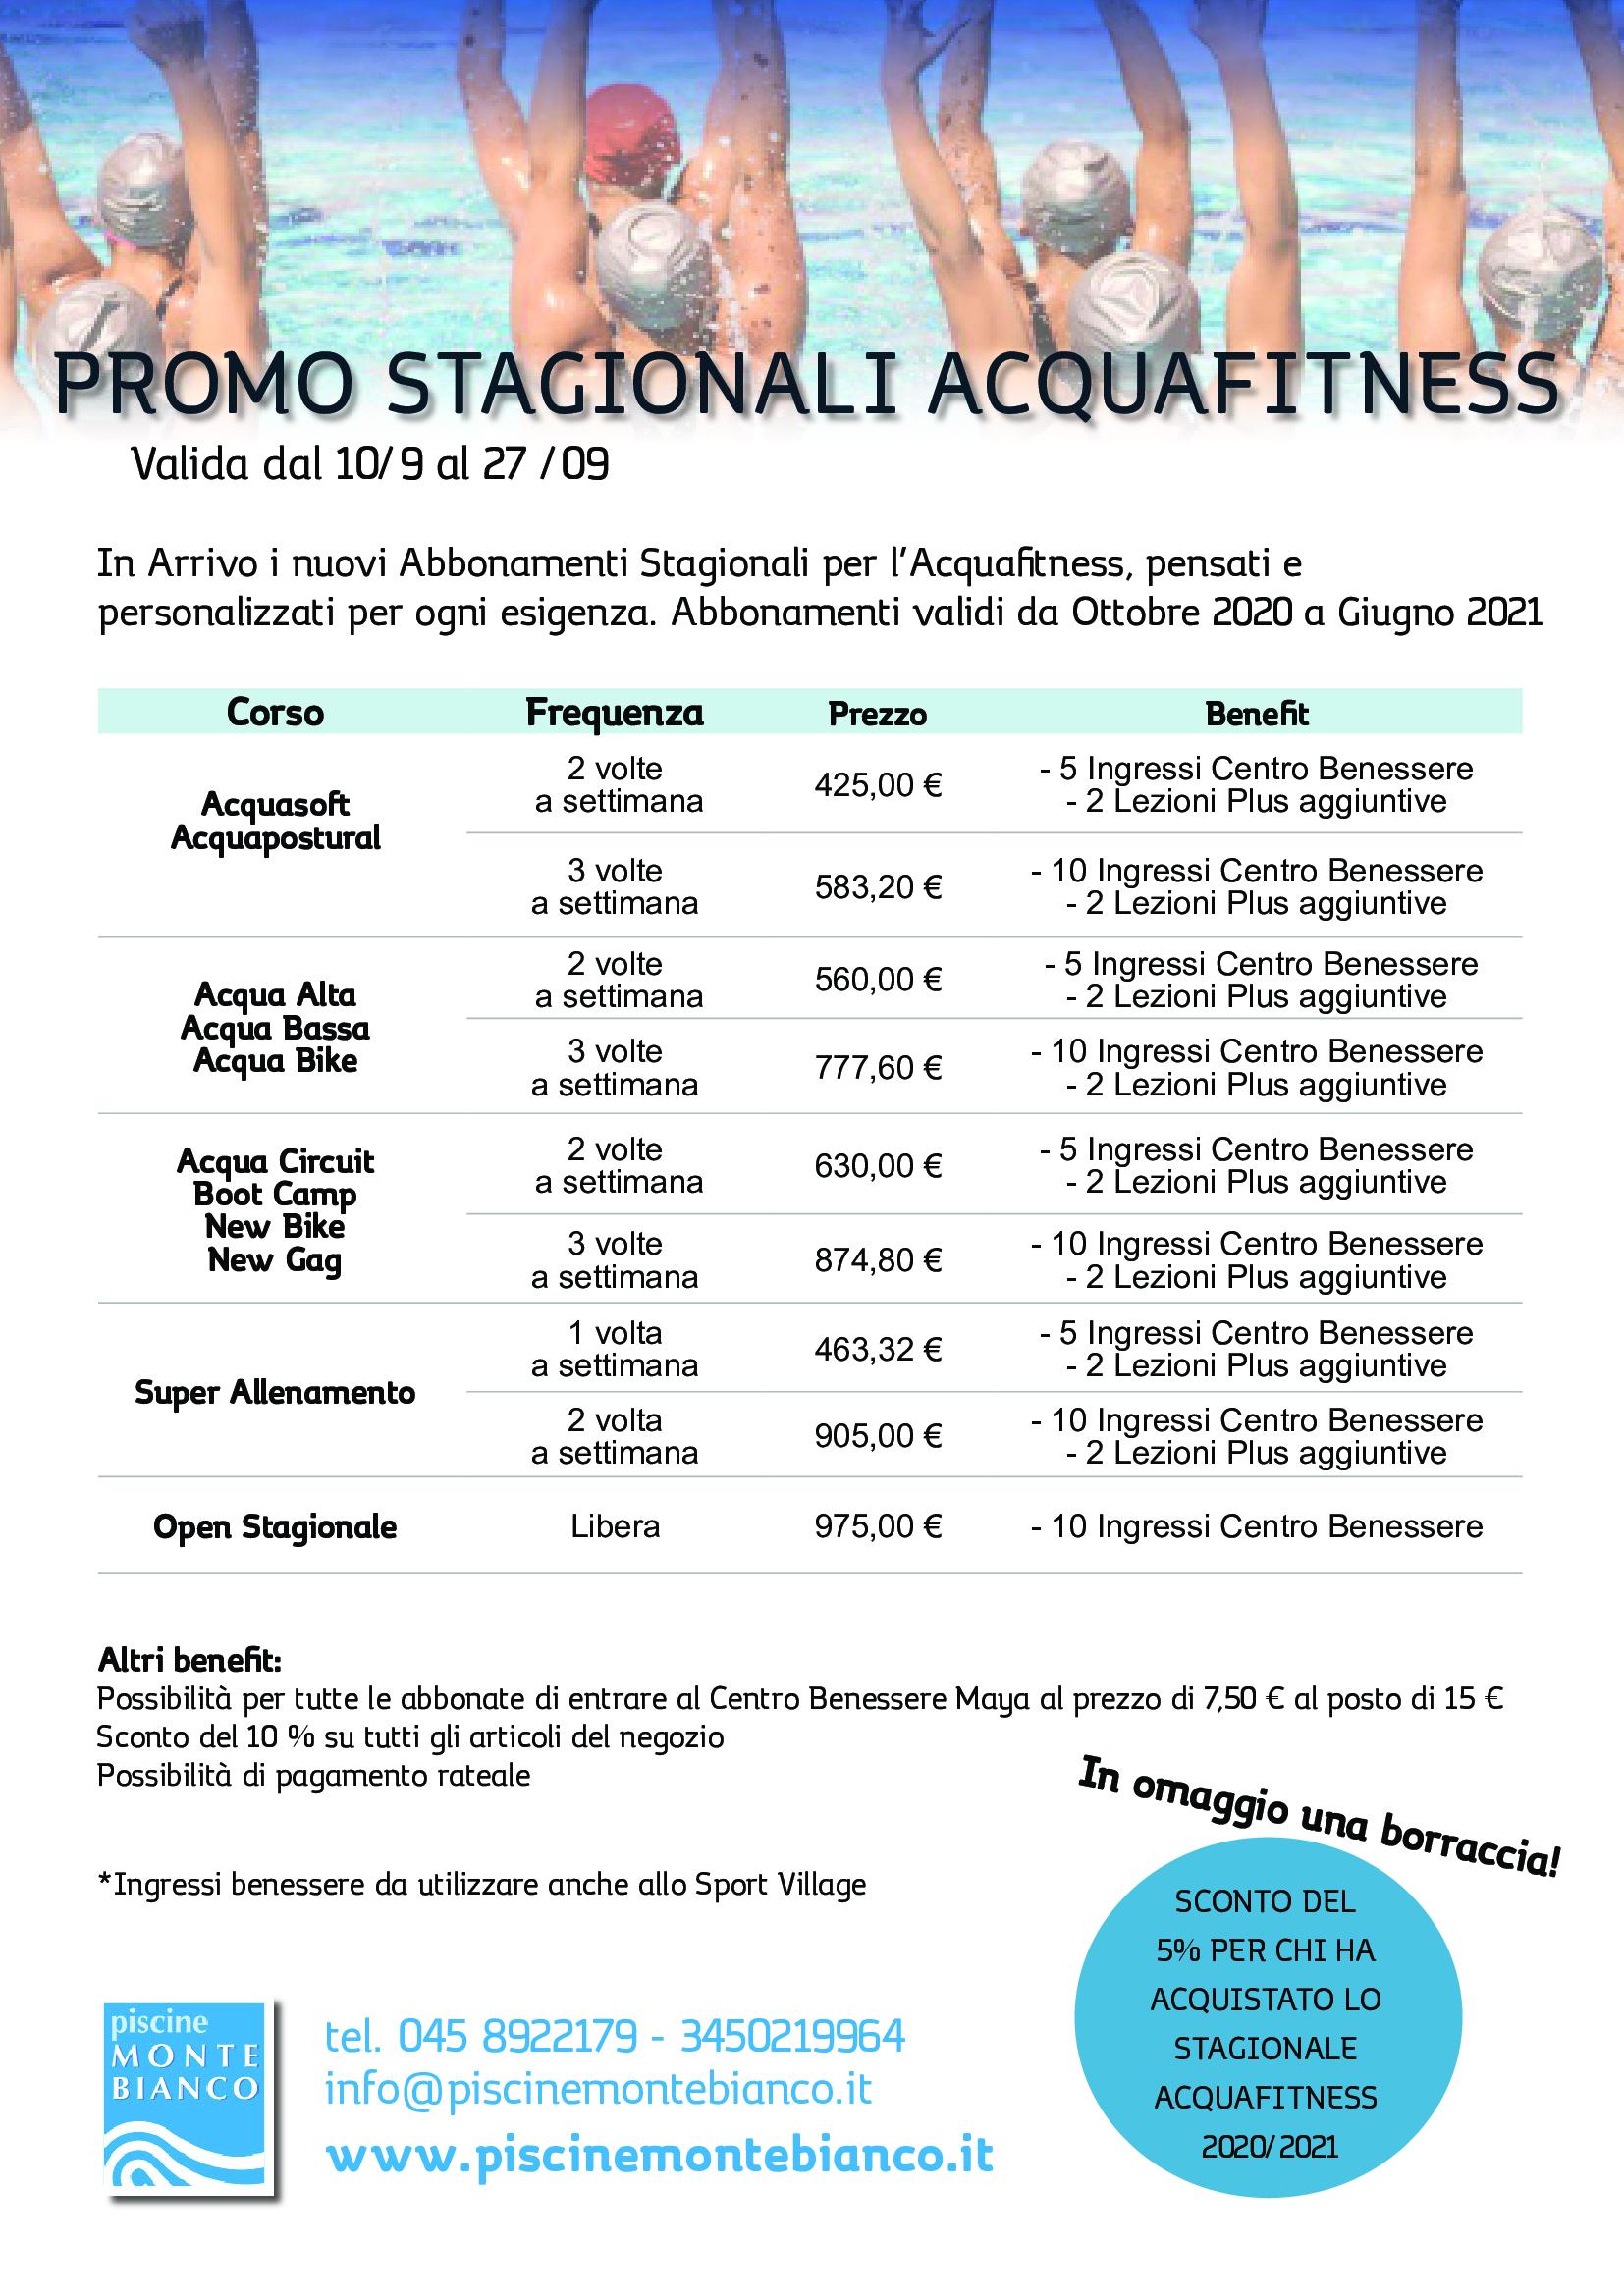 Promo Stagionali Acquafitness